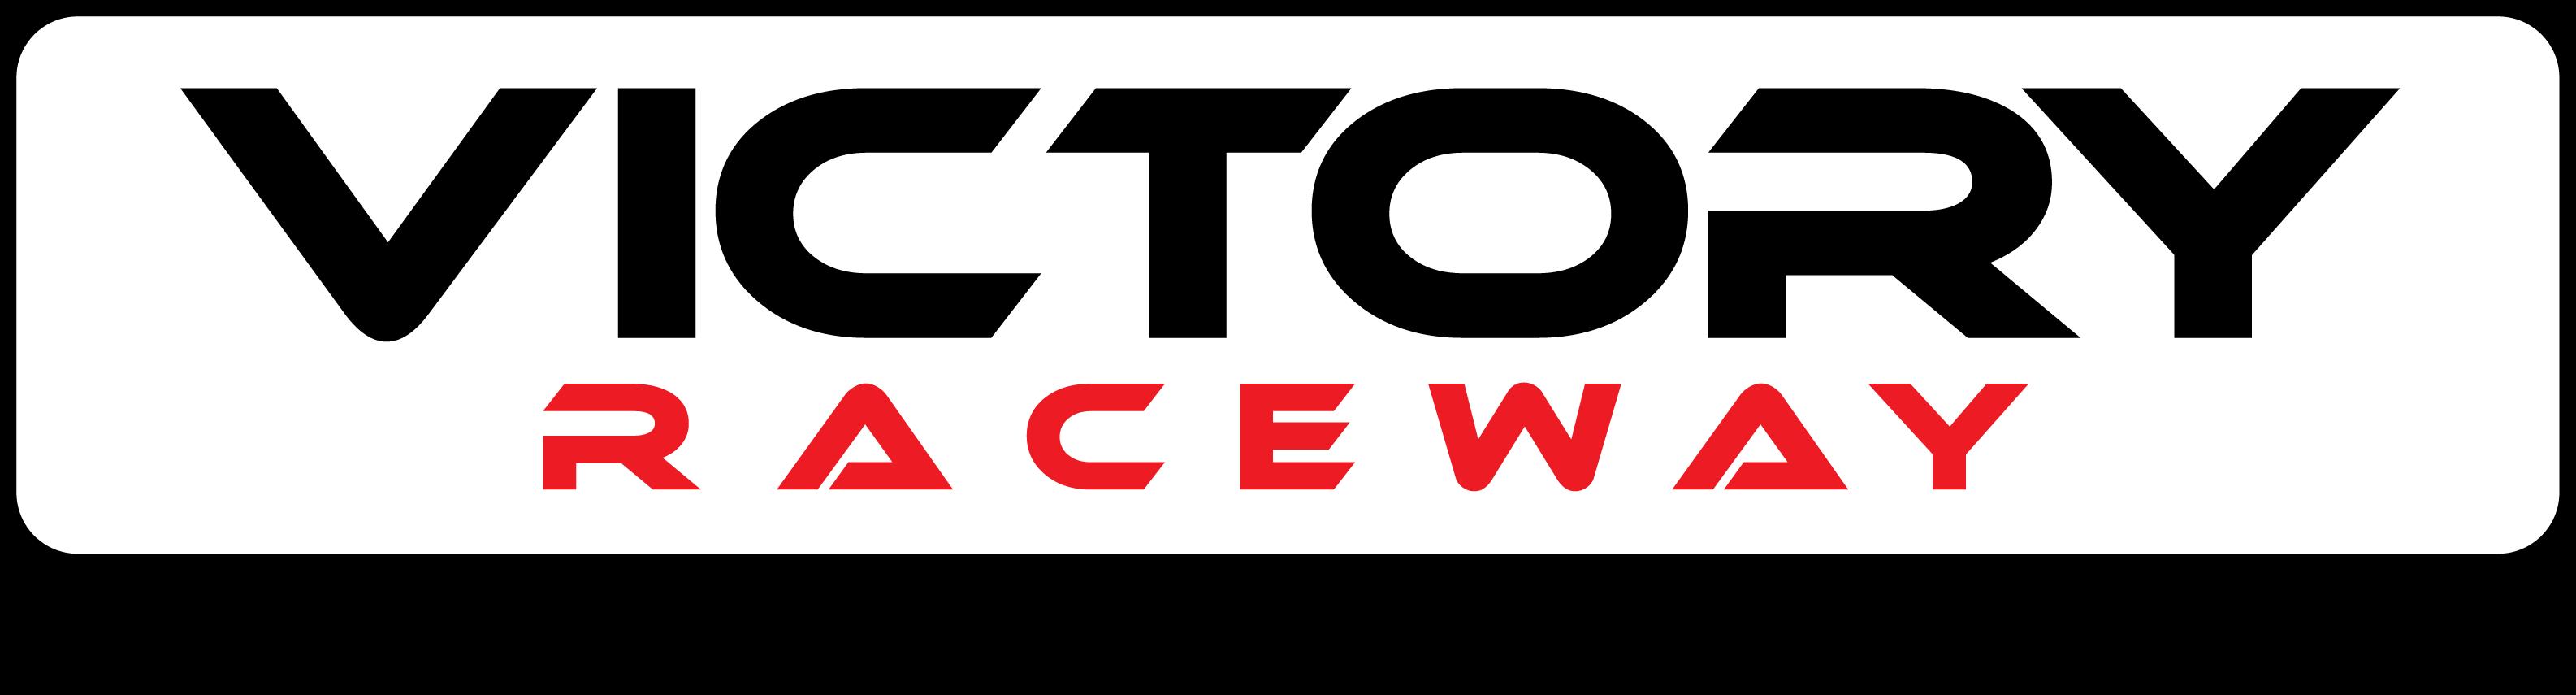 Victory Raceway